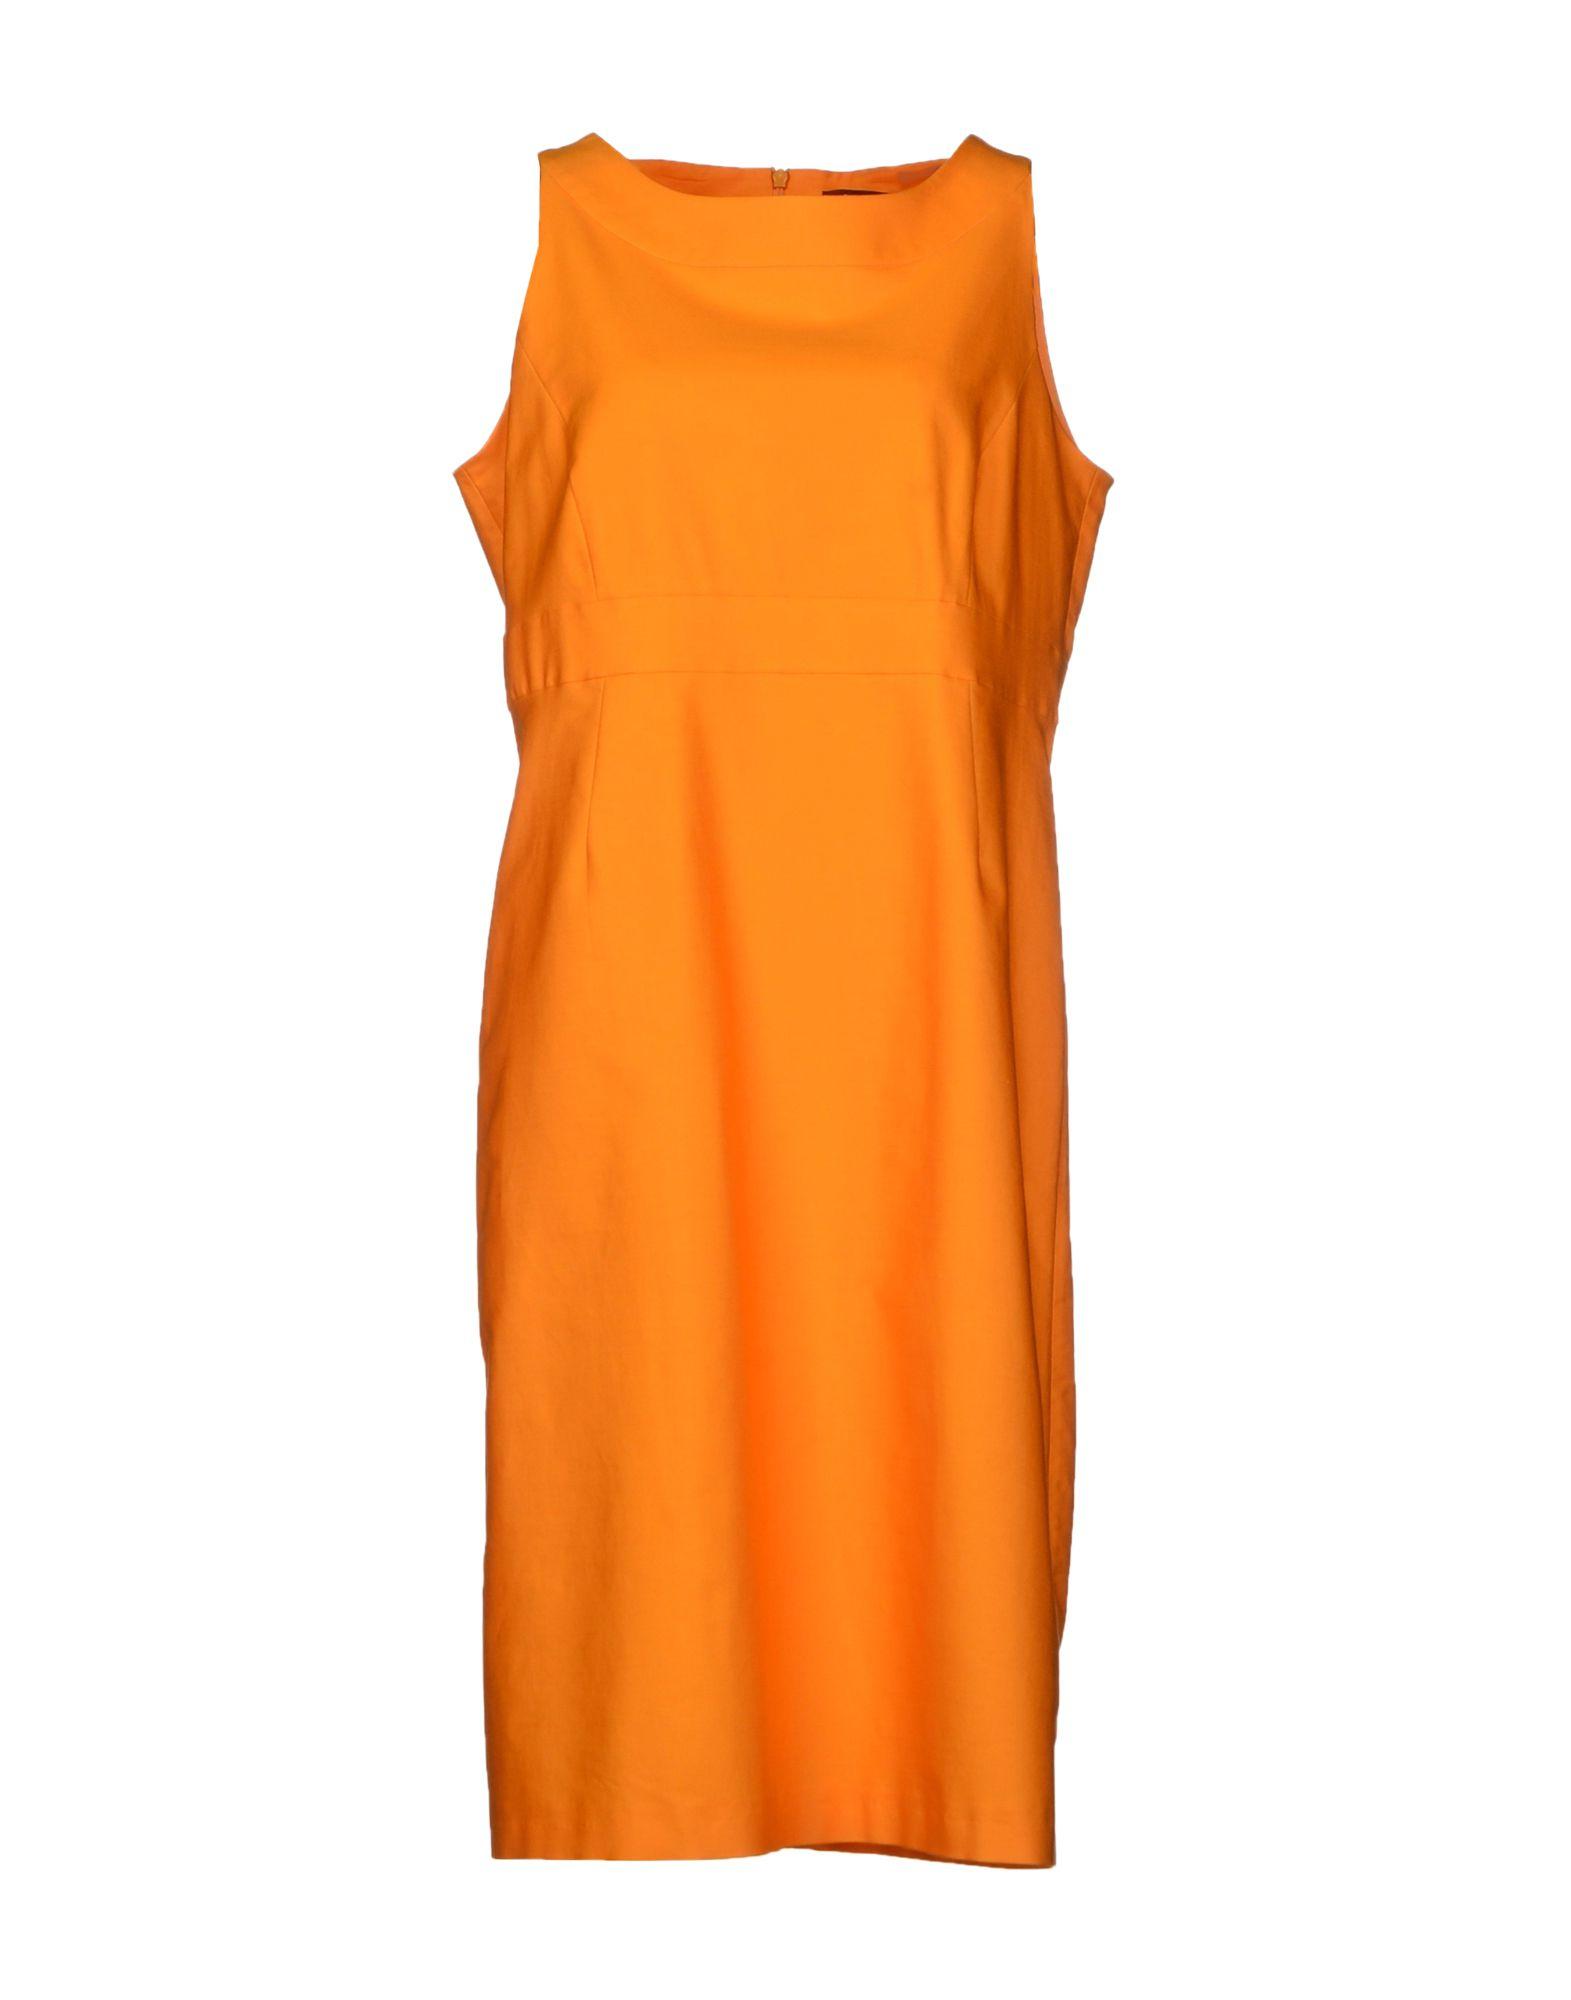 max mara studio knee length dress in orange lyst. Black Bedroom Furniture Sets. Home Design Ideas